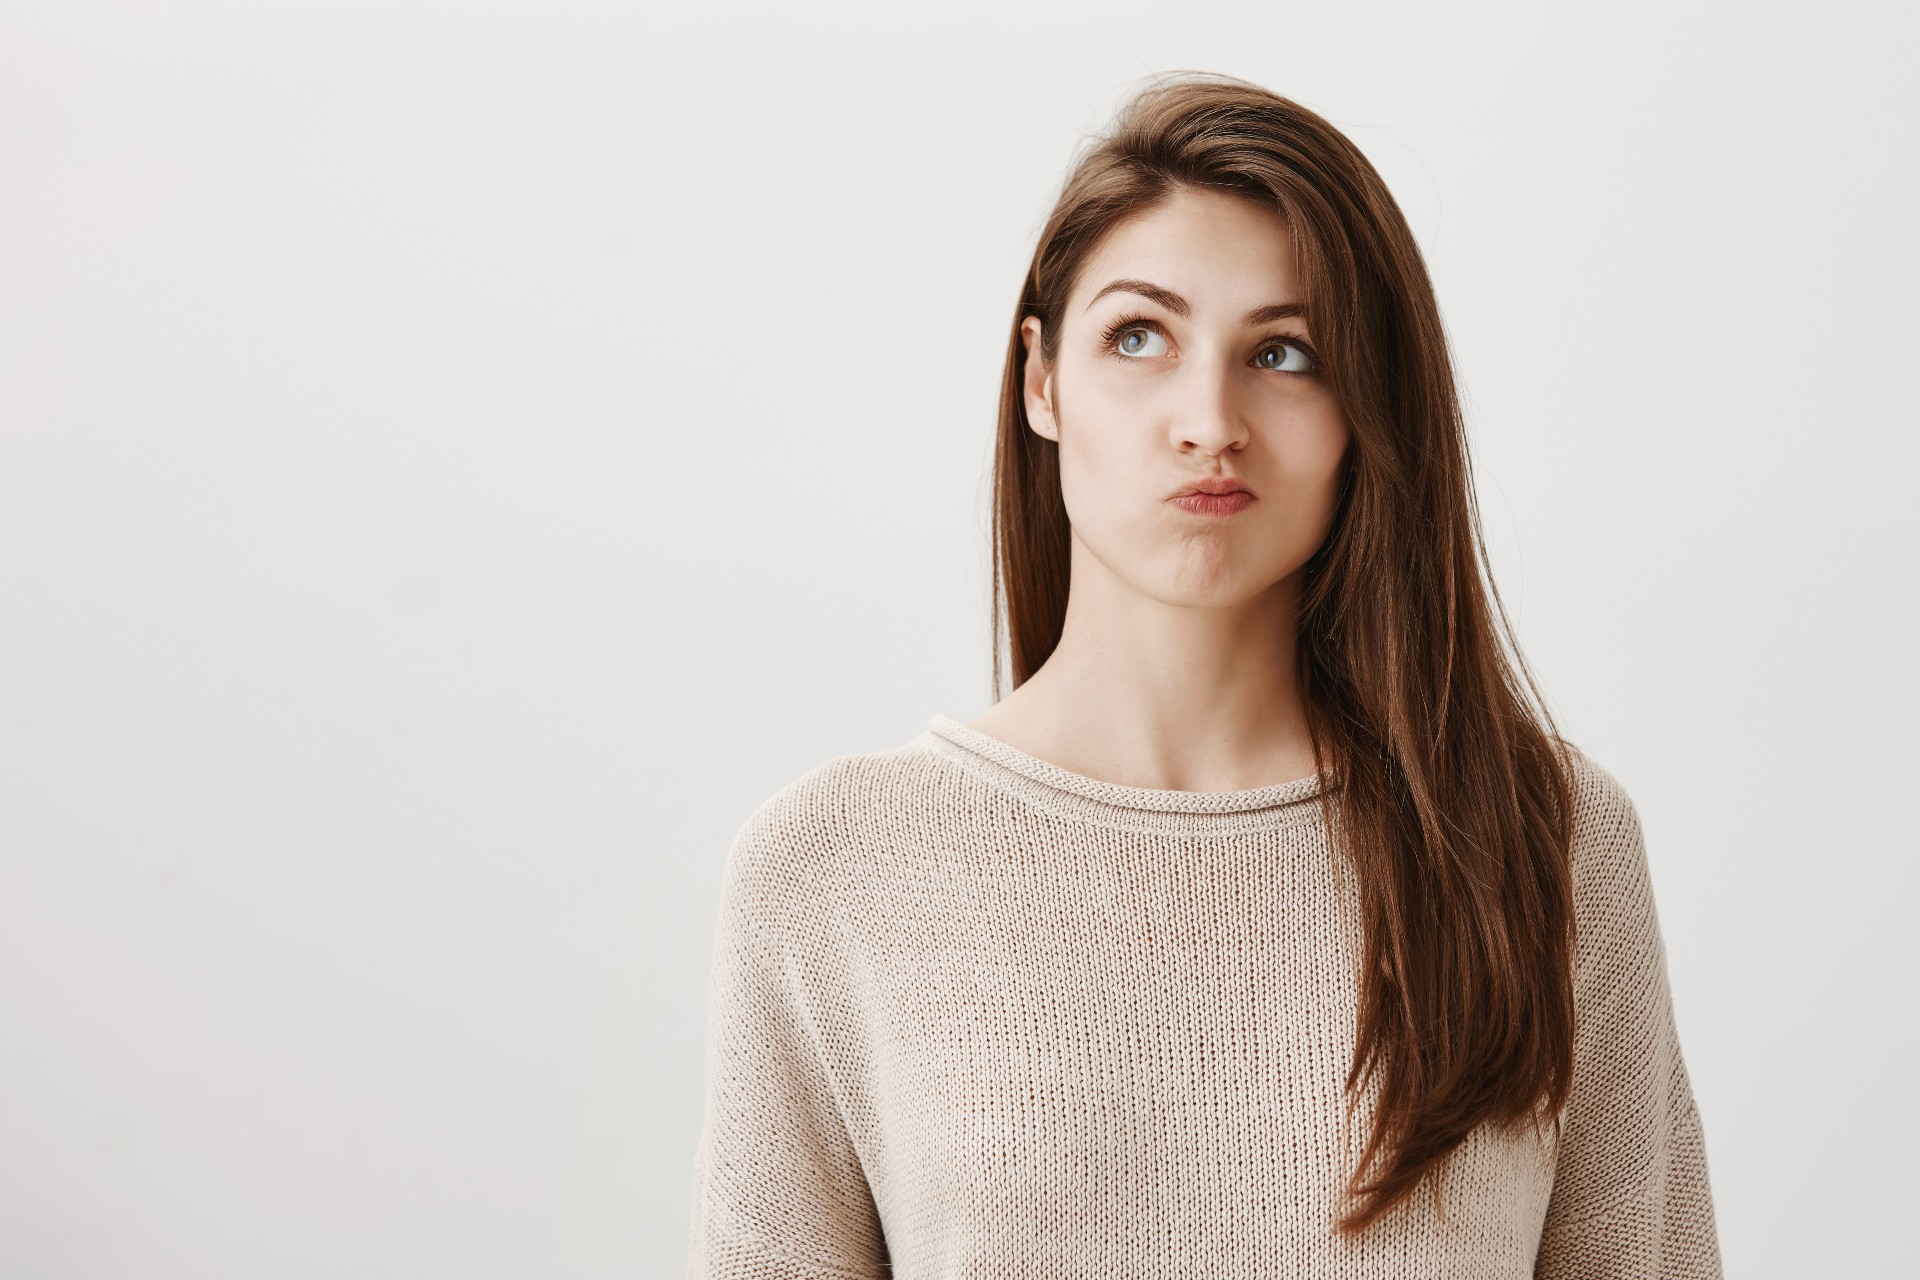 Memahami Arti & Perbedaan dari Introvert, Ekstrovert, dan Ambivert